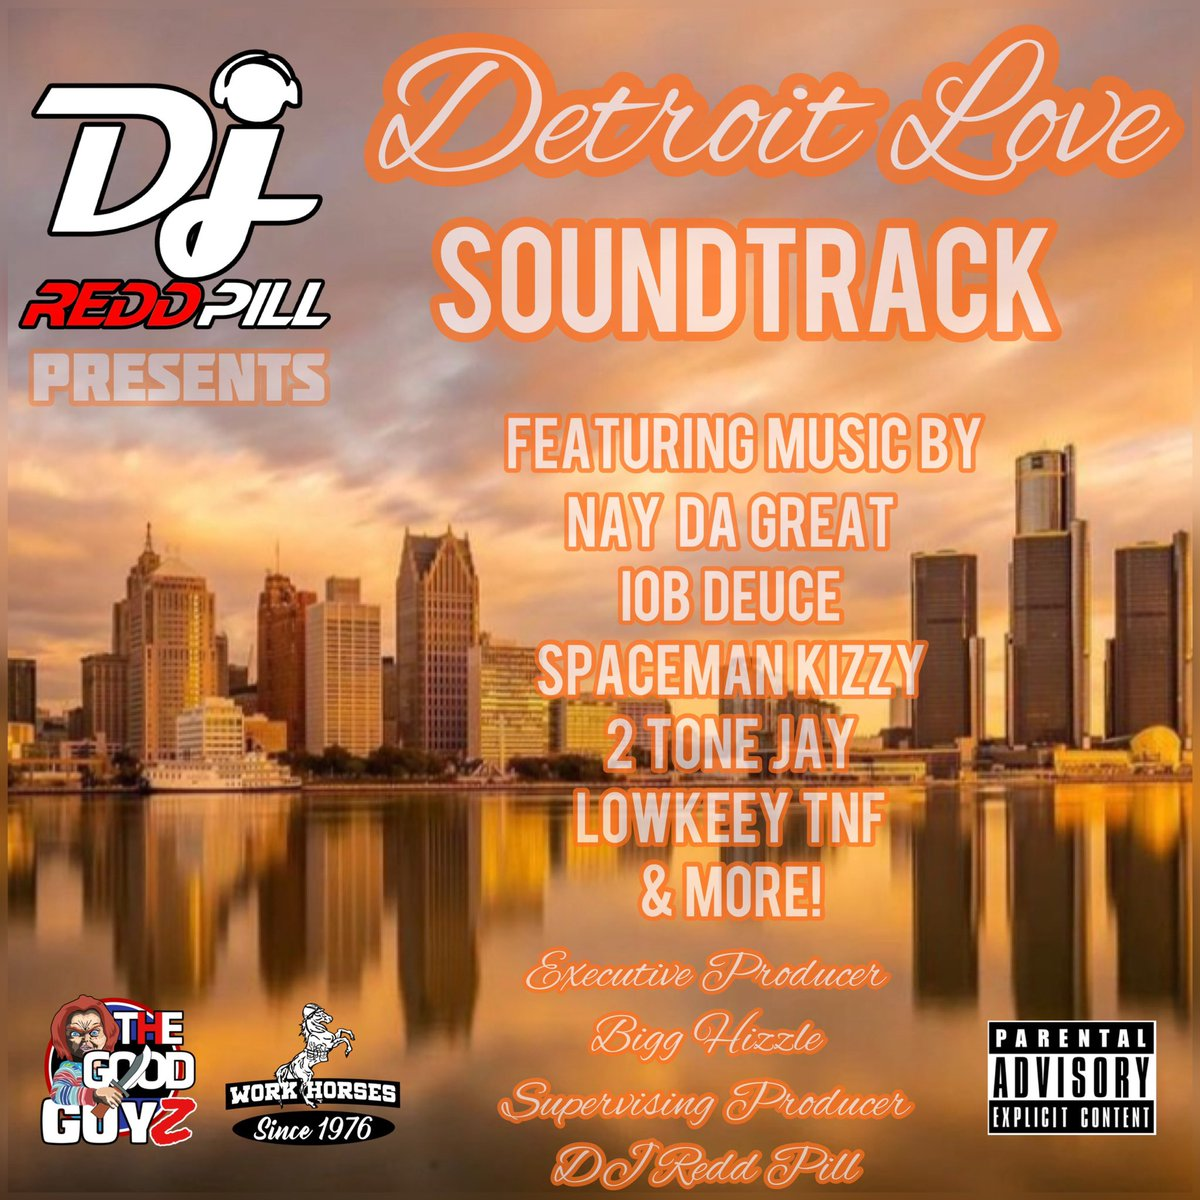 The Takeover has begun! #goodguyz #detroitlove #detroit #newmusic #newmovie #hiphop https://t.co/gxasV5n05z